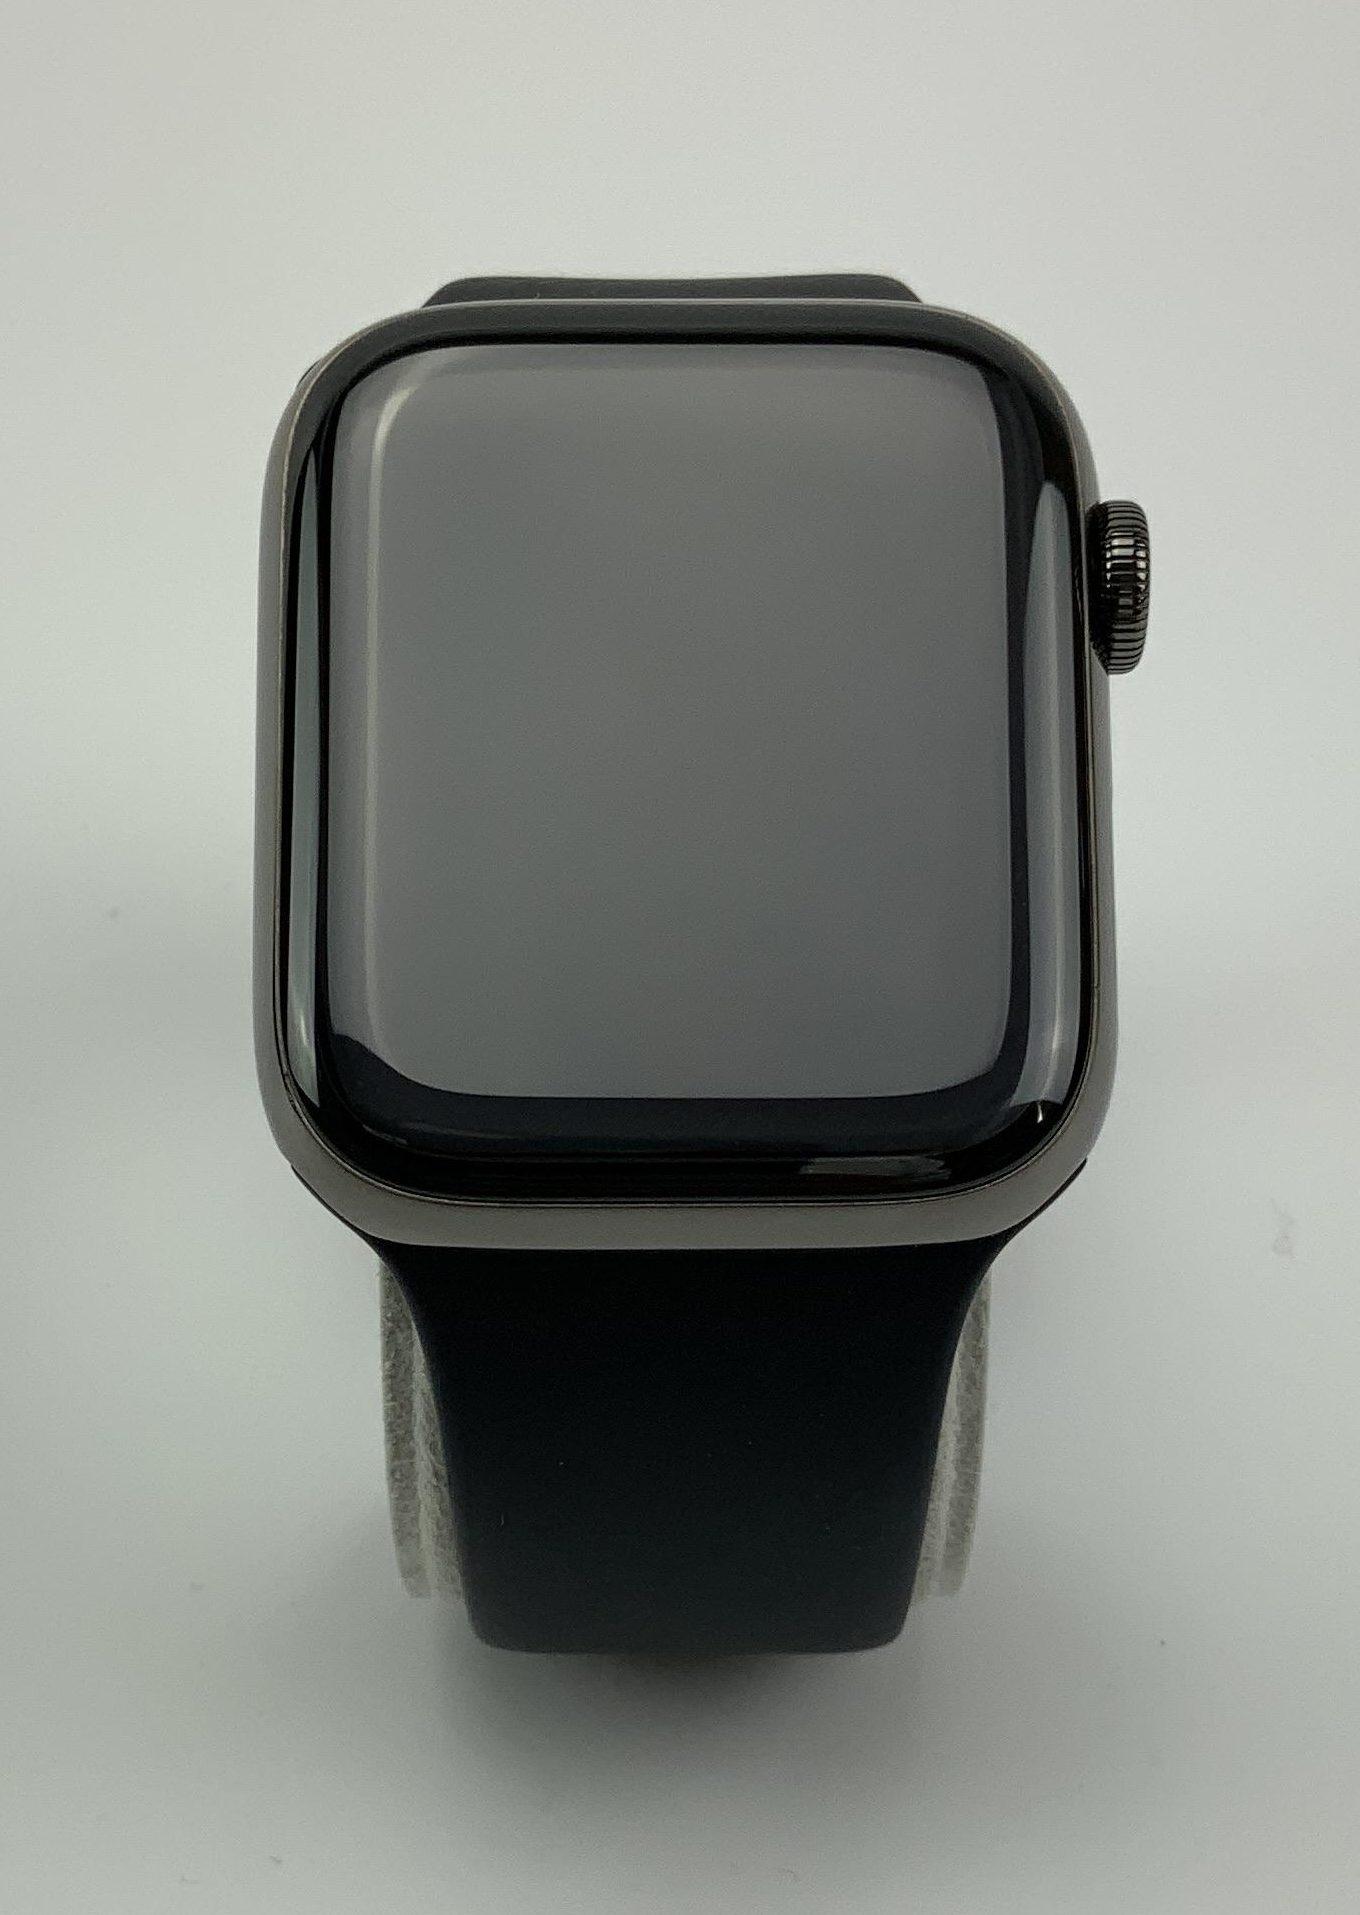 Watch Series 6 Steel Cellular (44mm), Graphite, Afbeelding 1